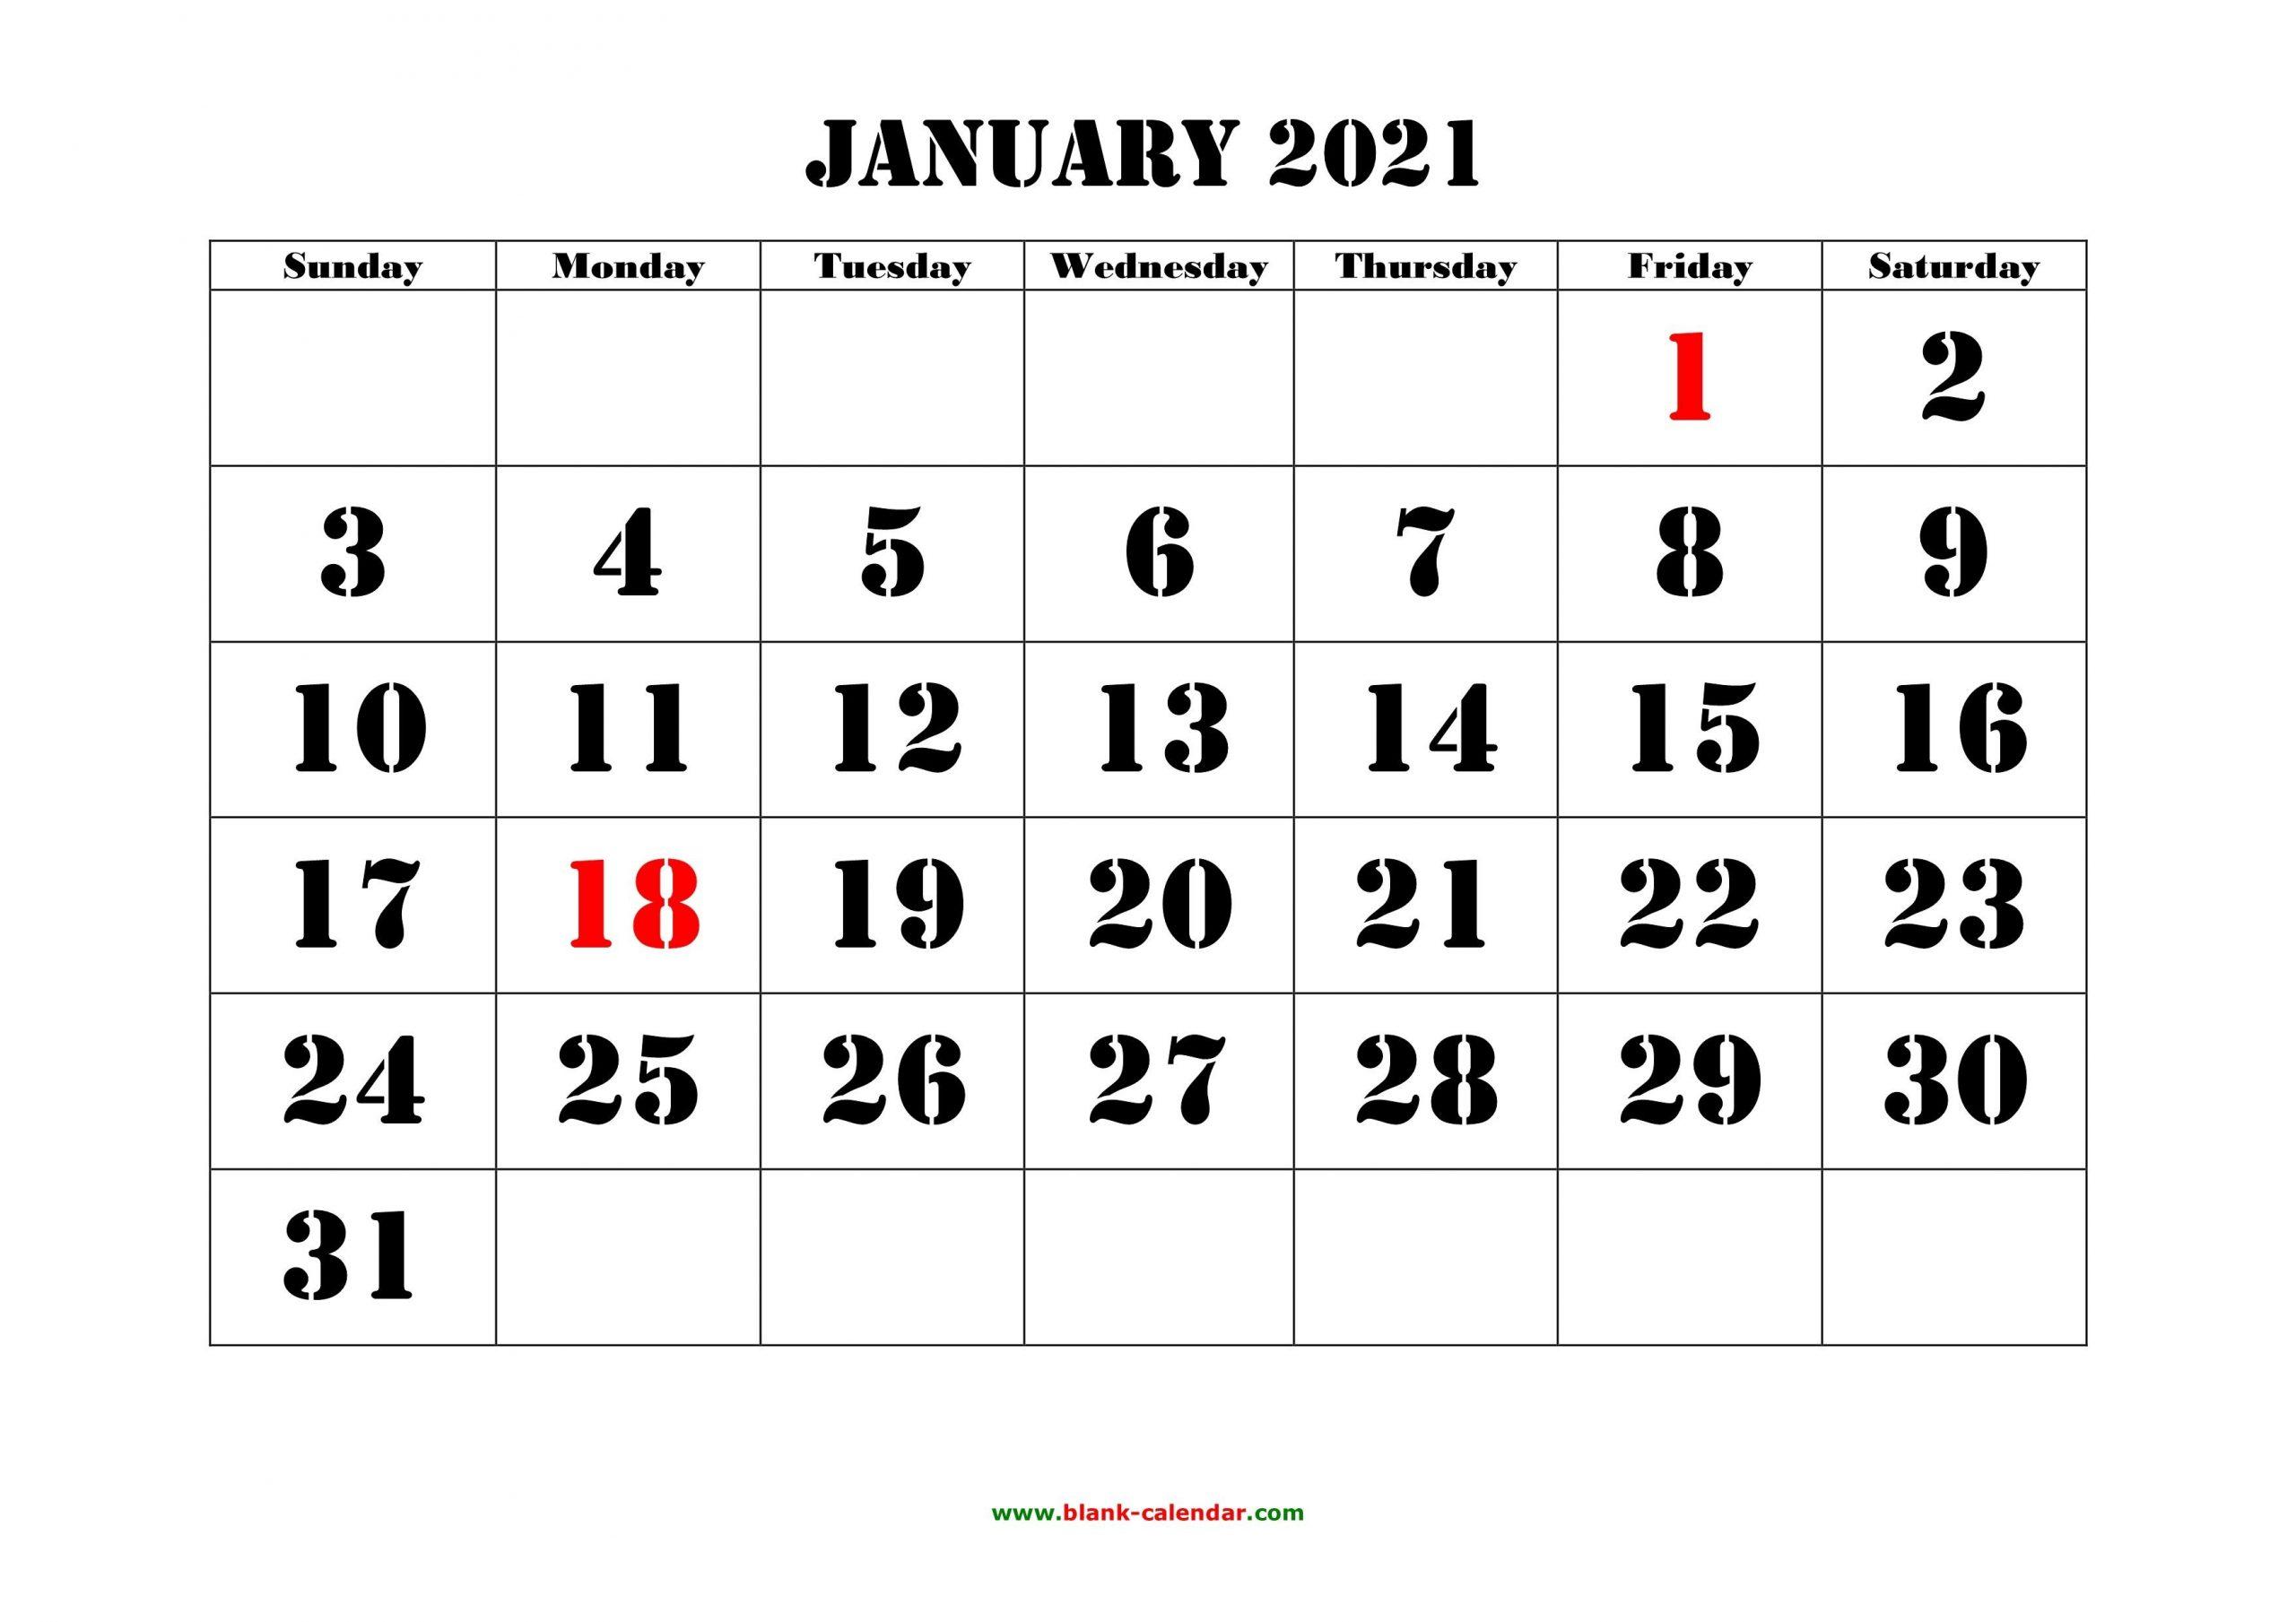 January 2021 Calendar Free Download Printable Calendar 1